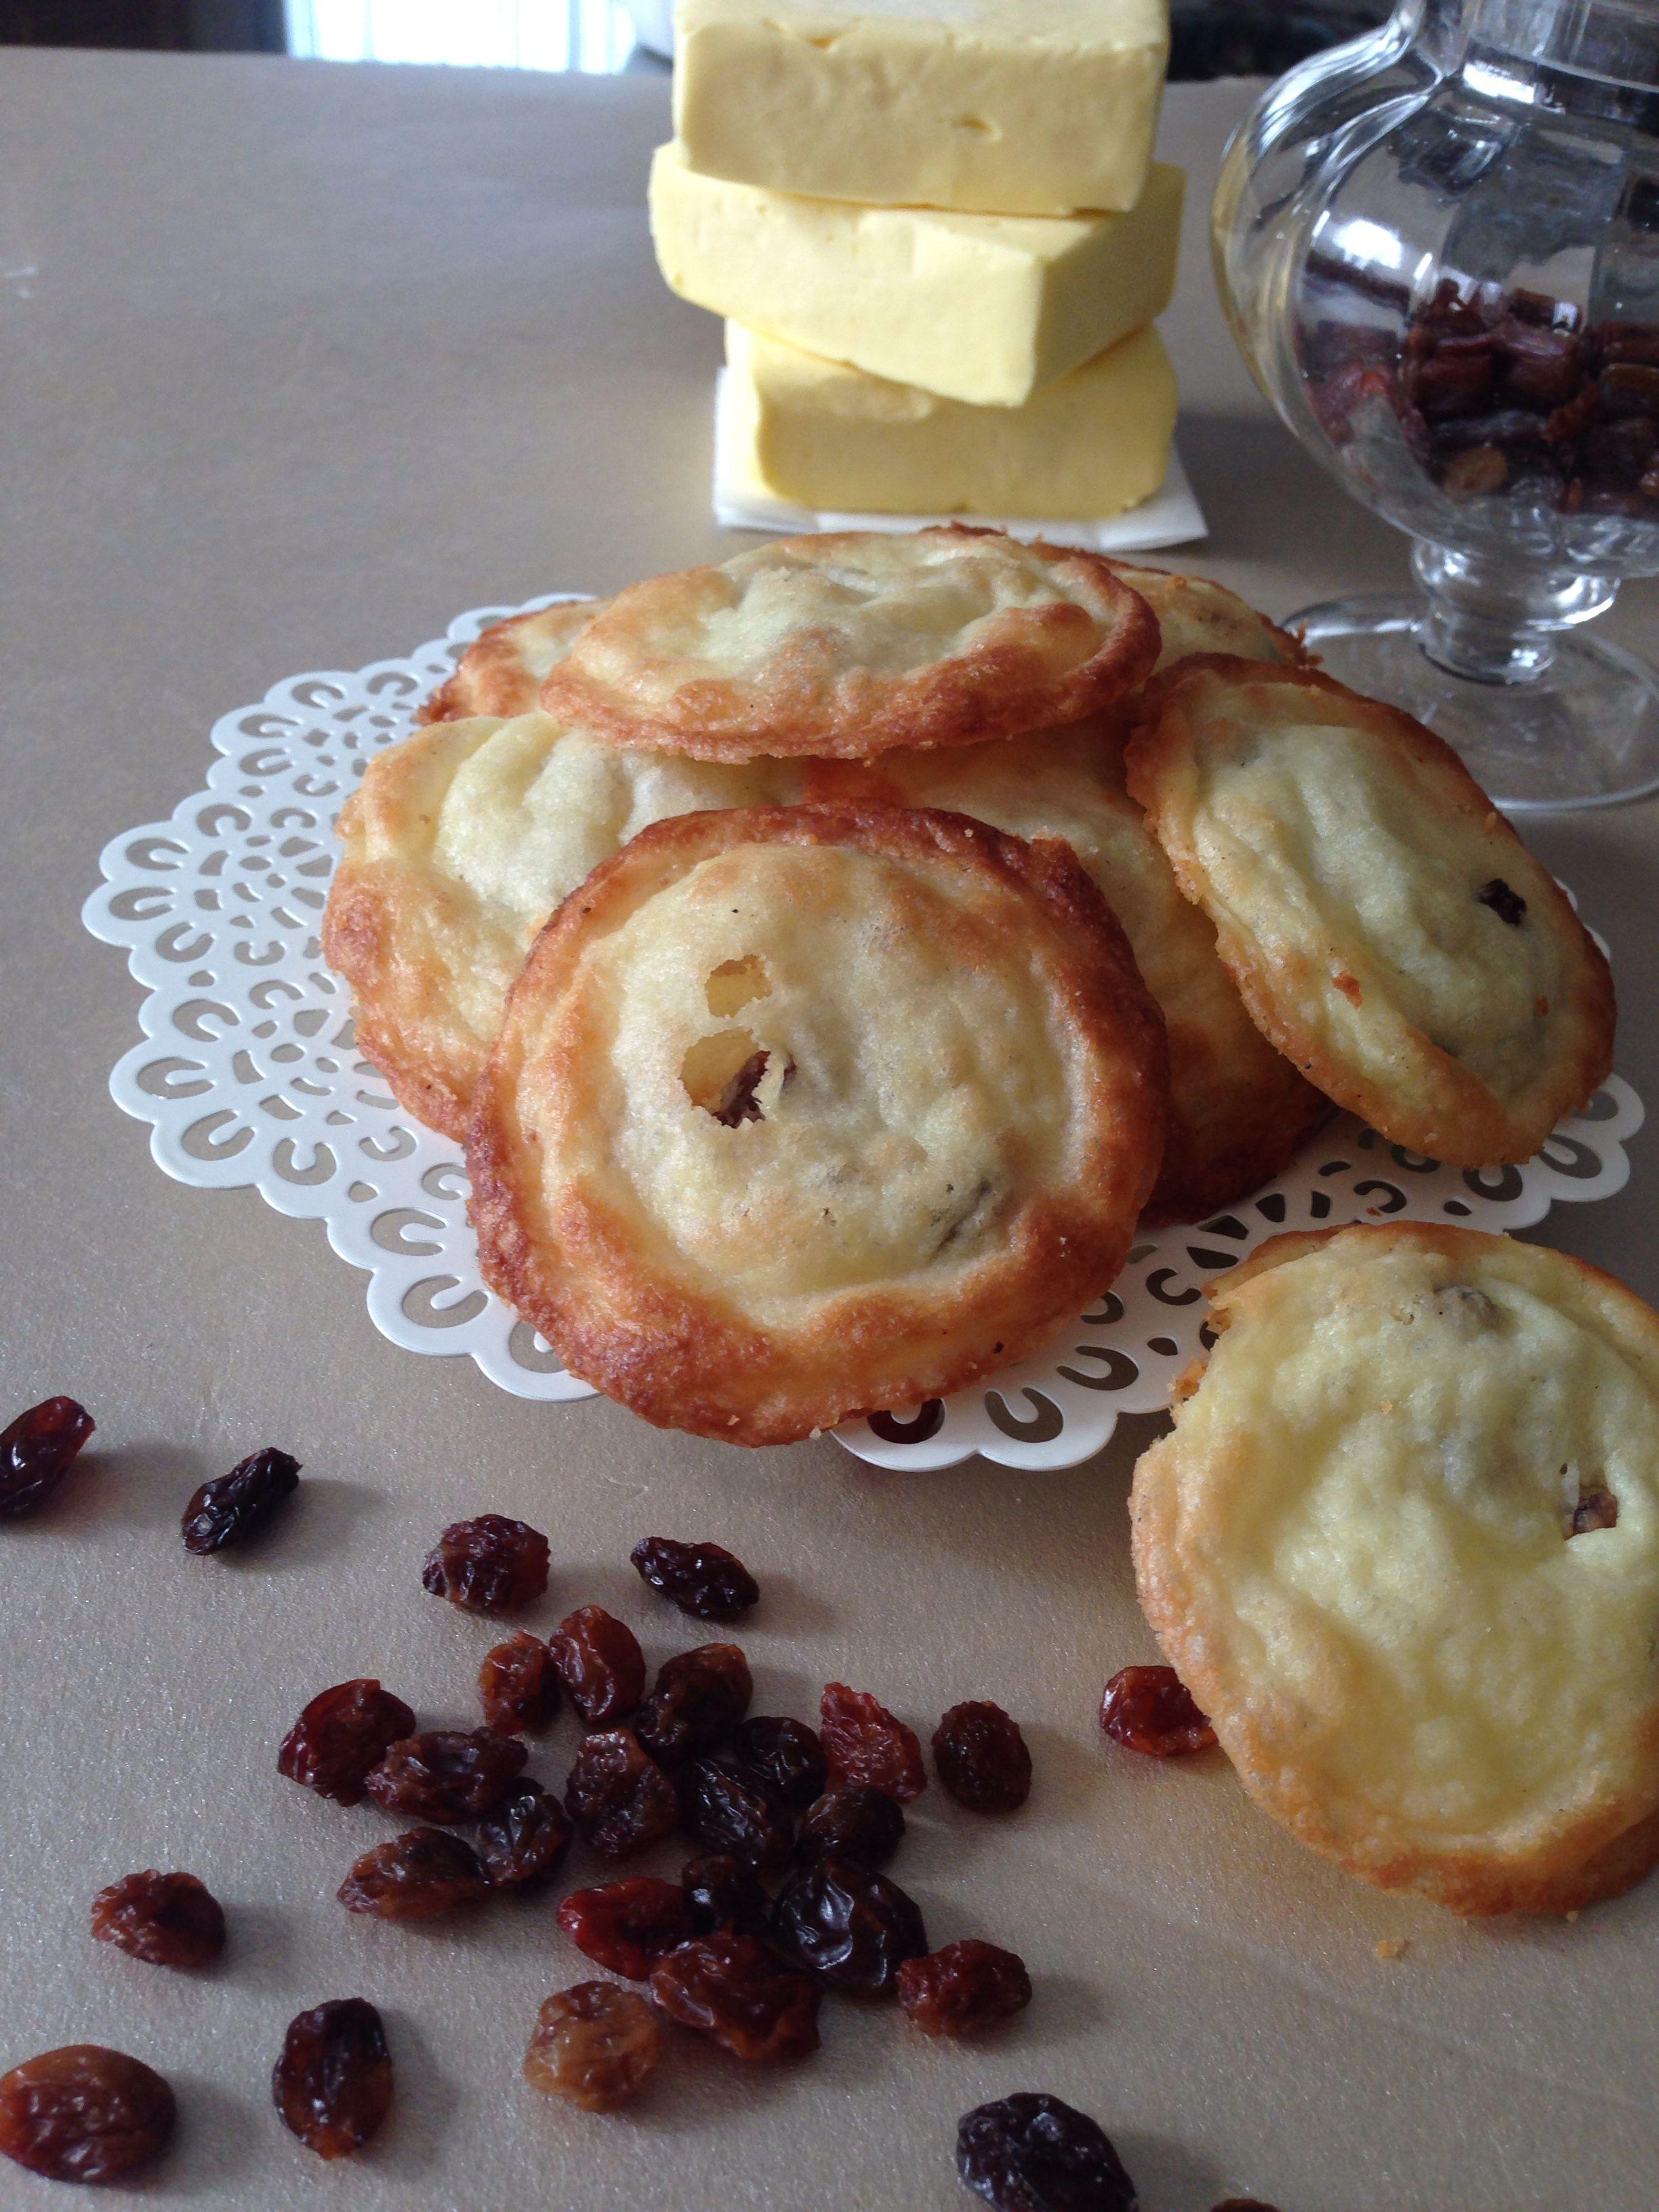 Sultana cookies